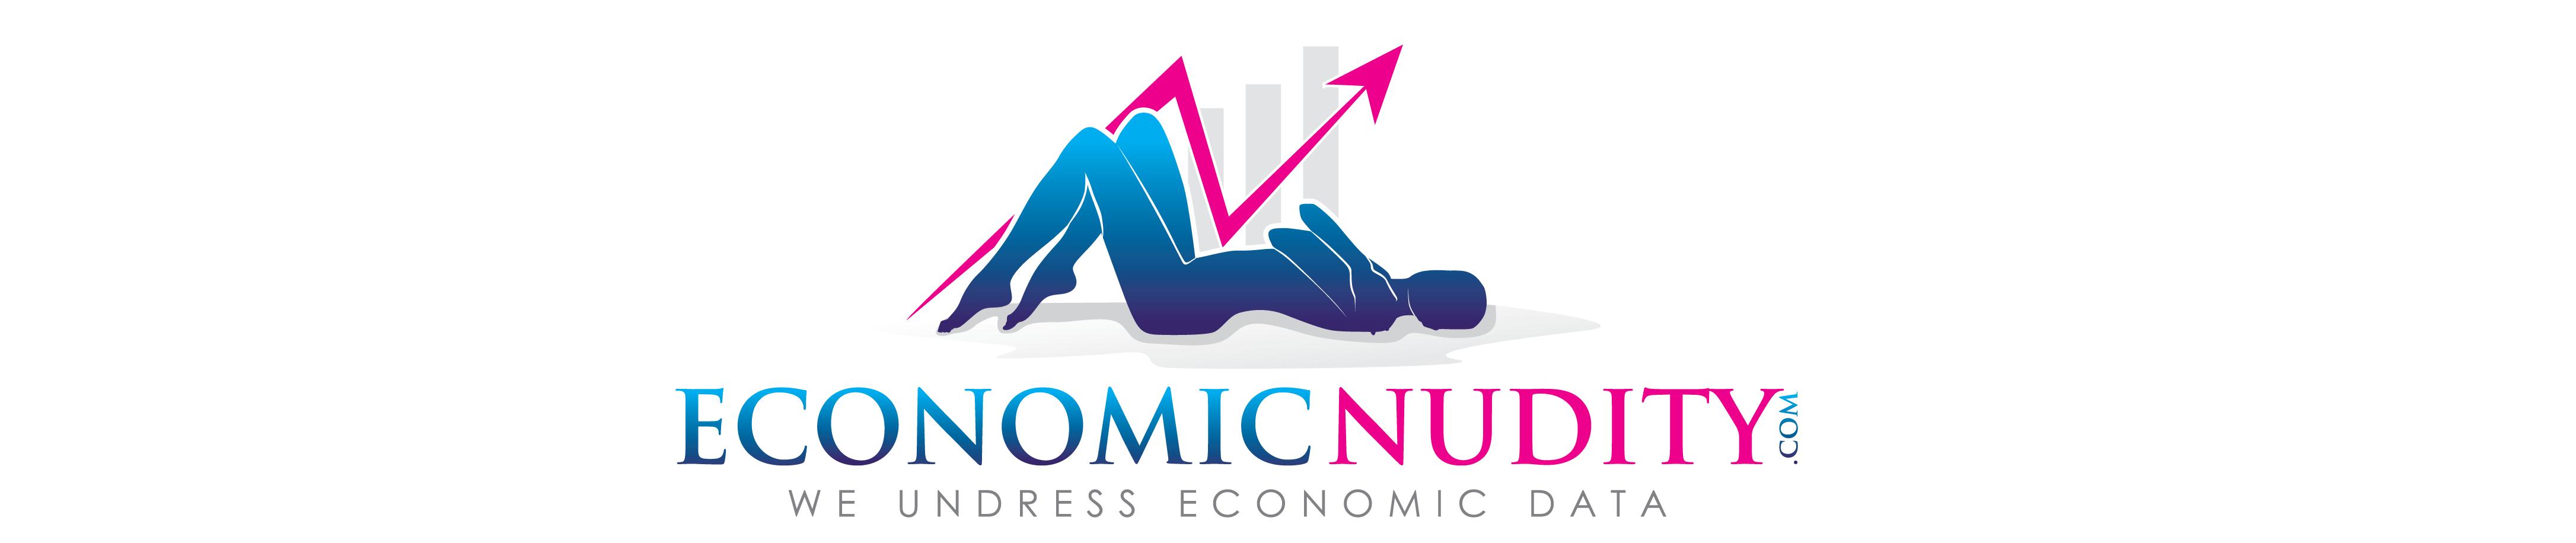 economicnudity stretch